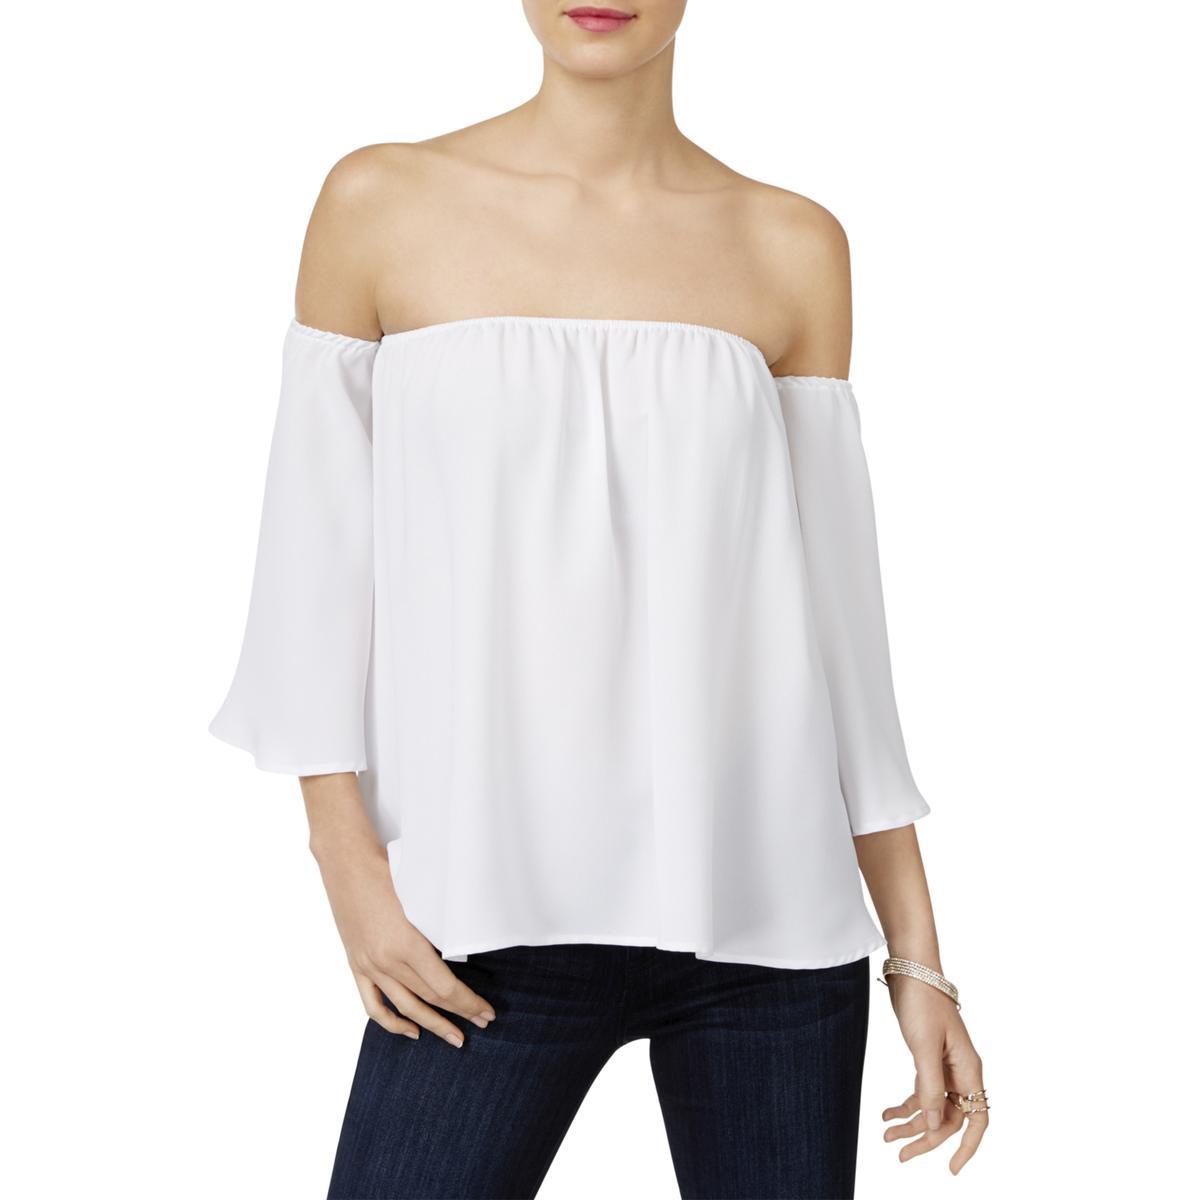 a83f713bf9fa0 Inc Womens White Chiffon off The Shoulder Casual Blouse Top L BHFO ...